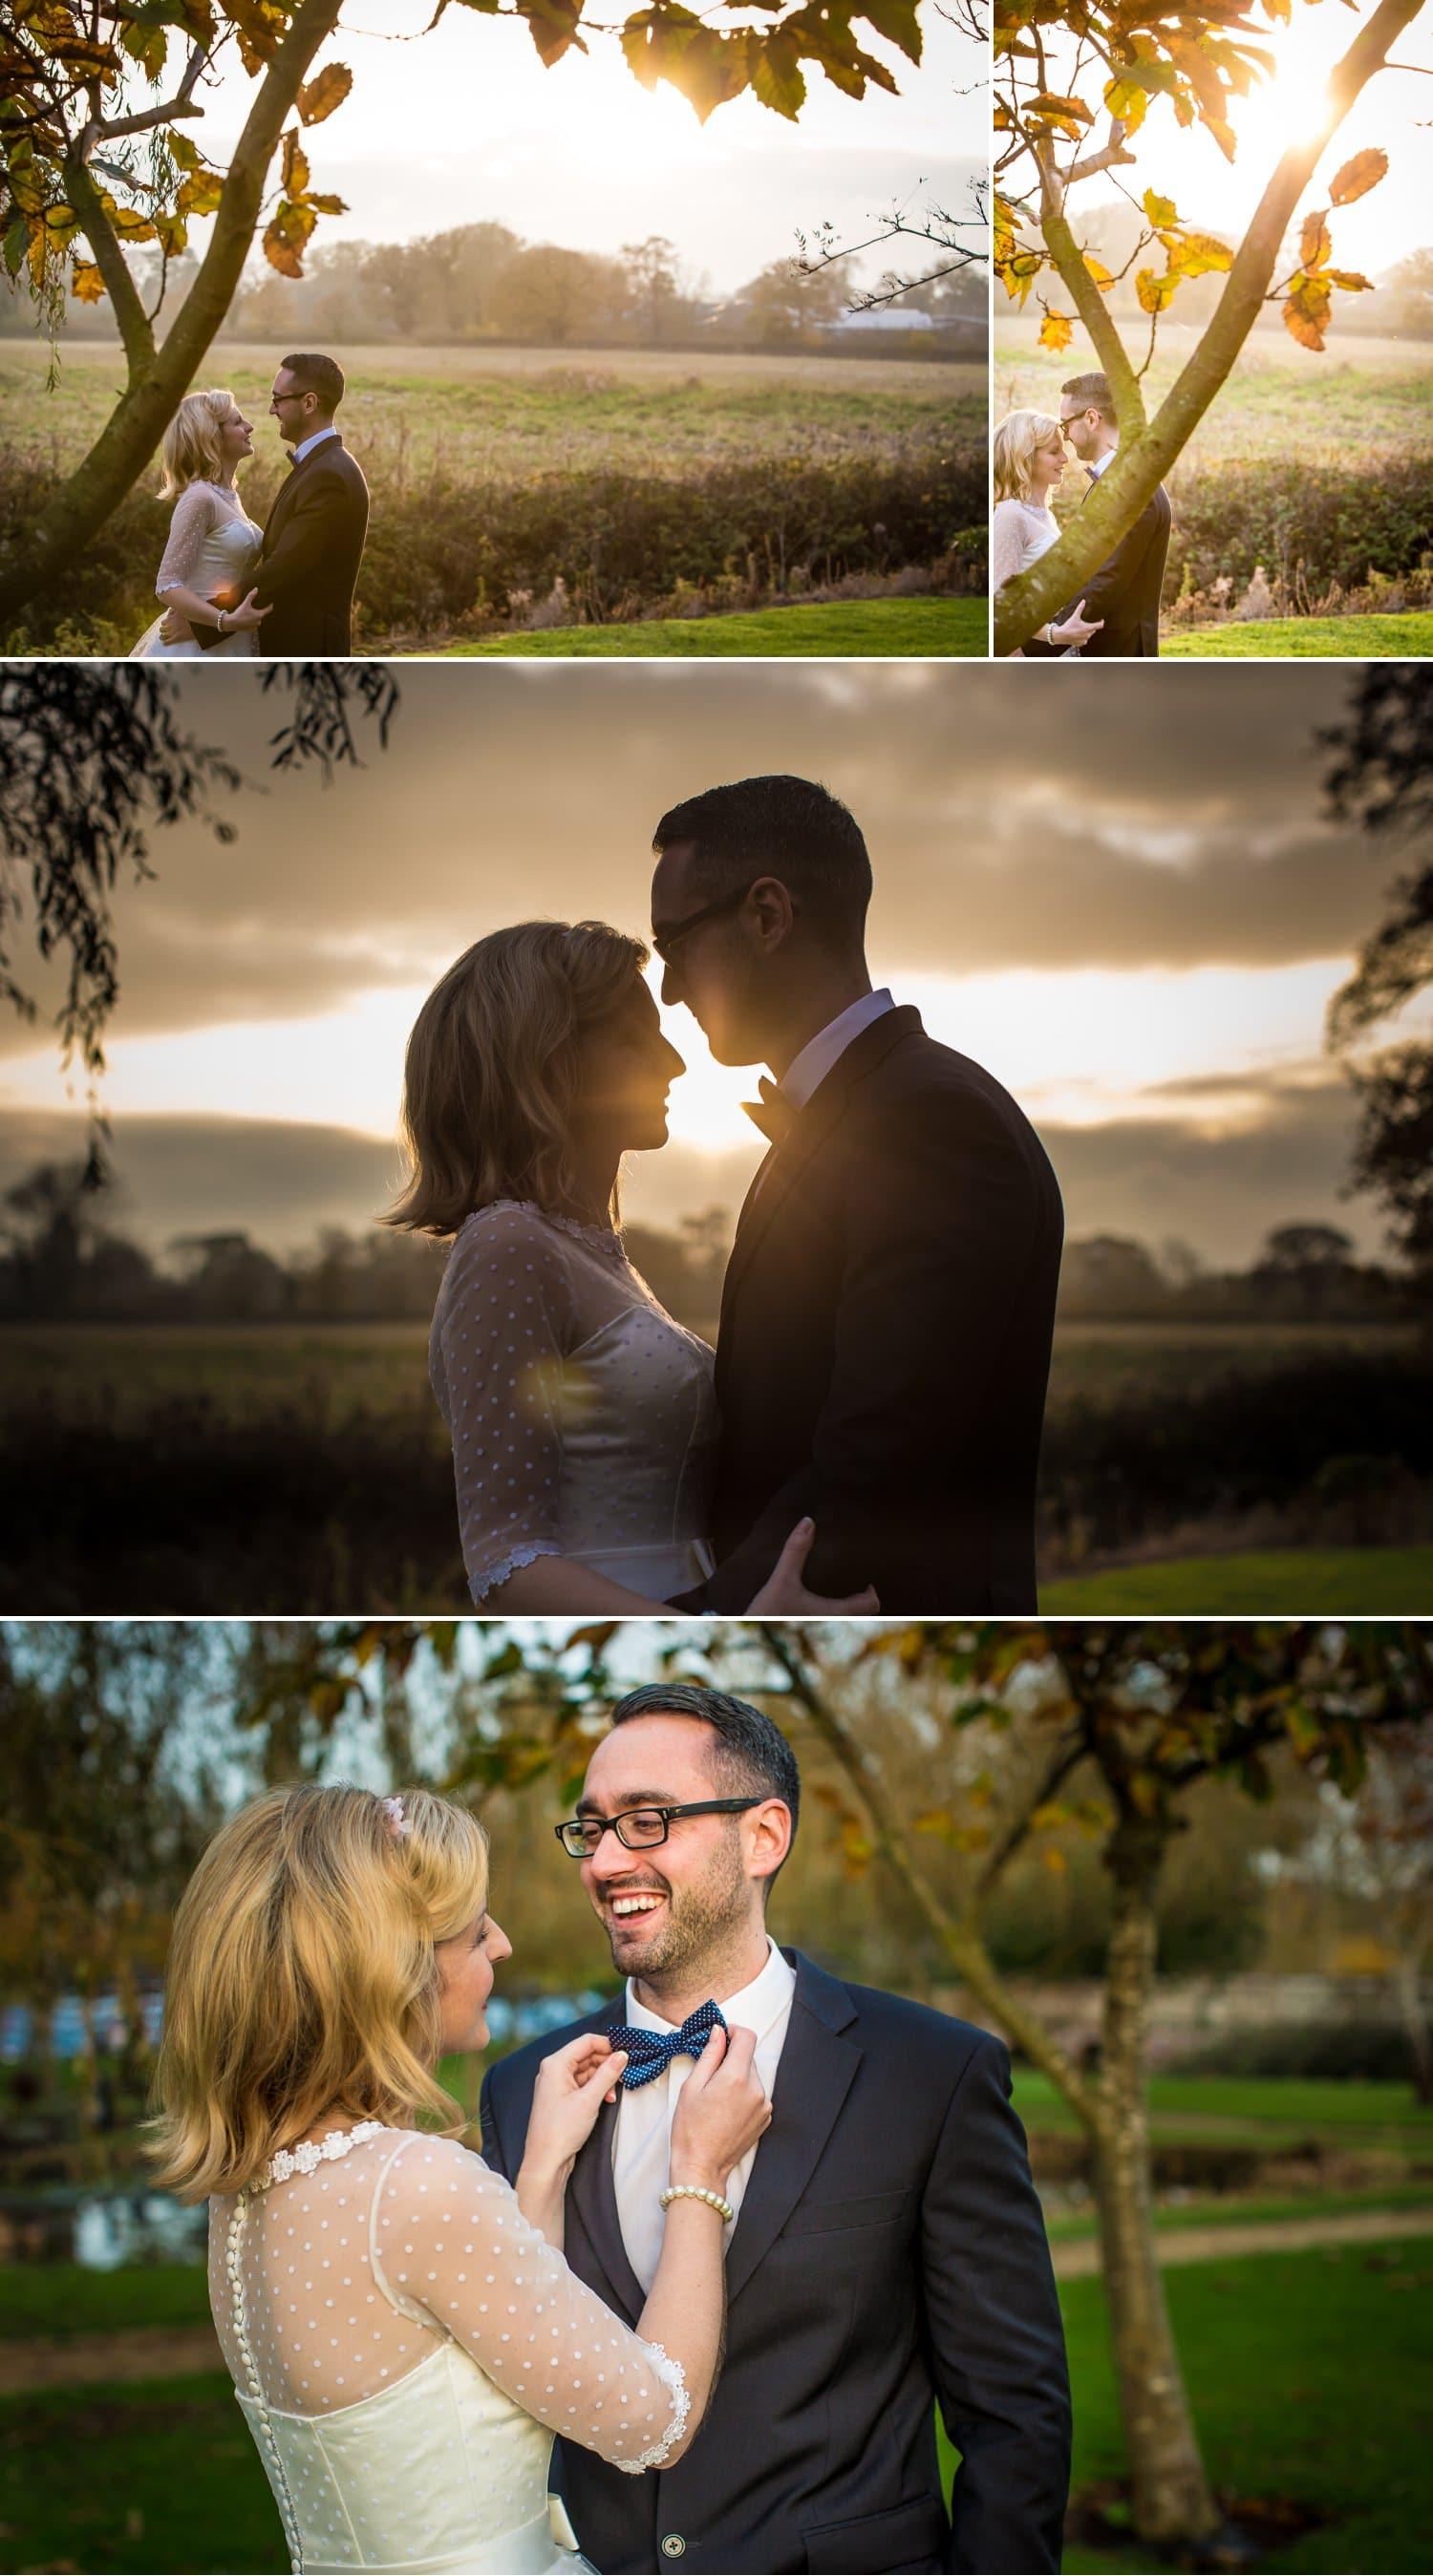 Wedding photography portraits, grosvenor pulford chester